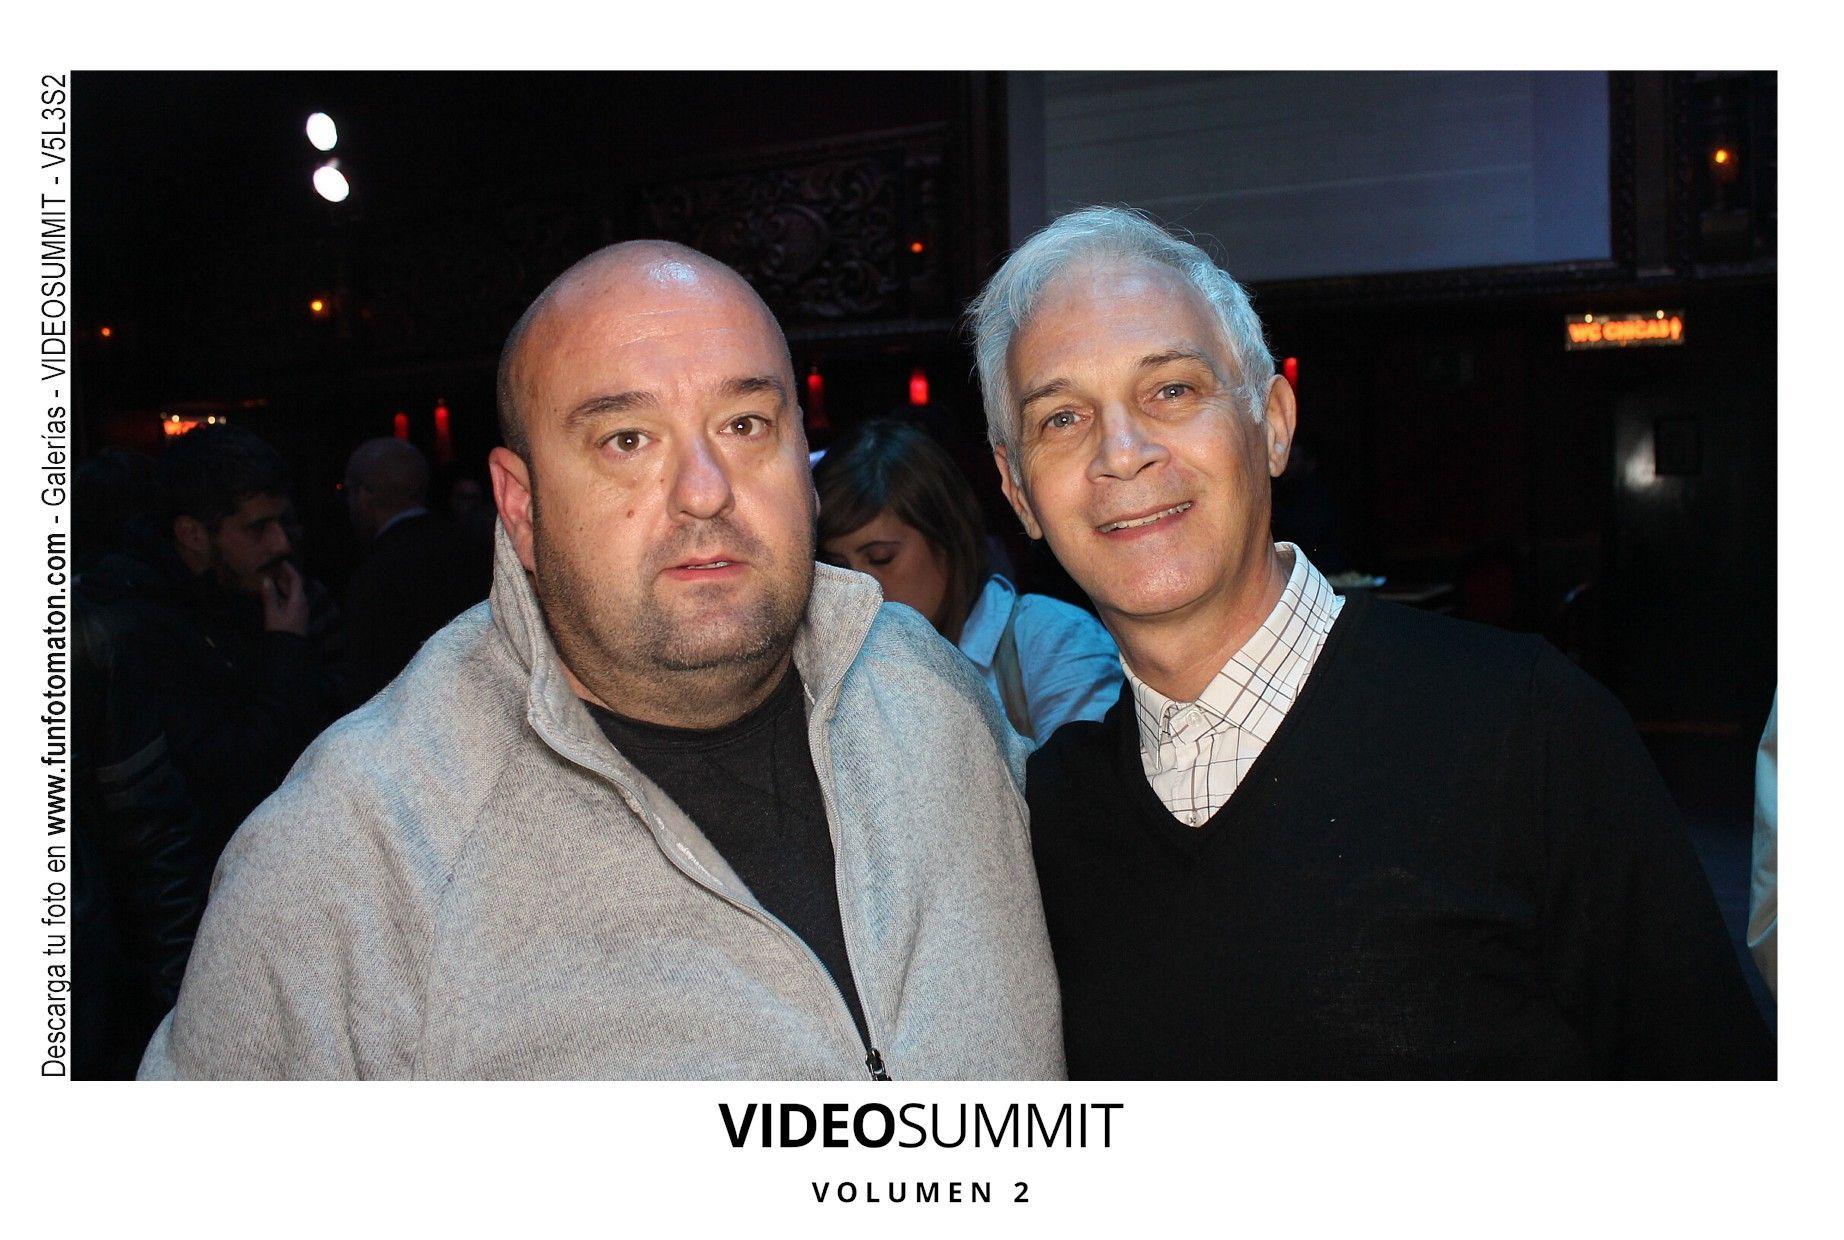 videosummit-vol2-club-party-069